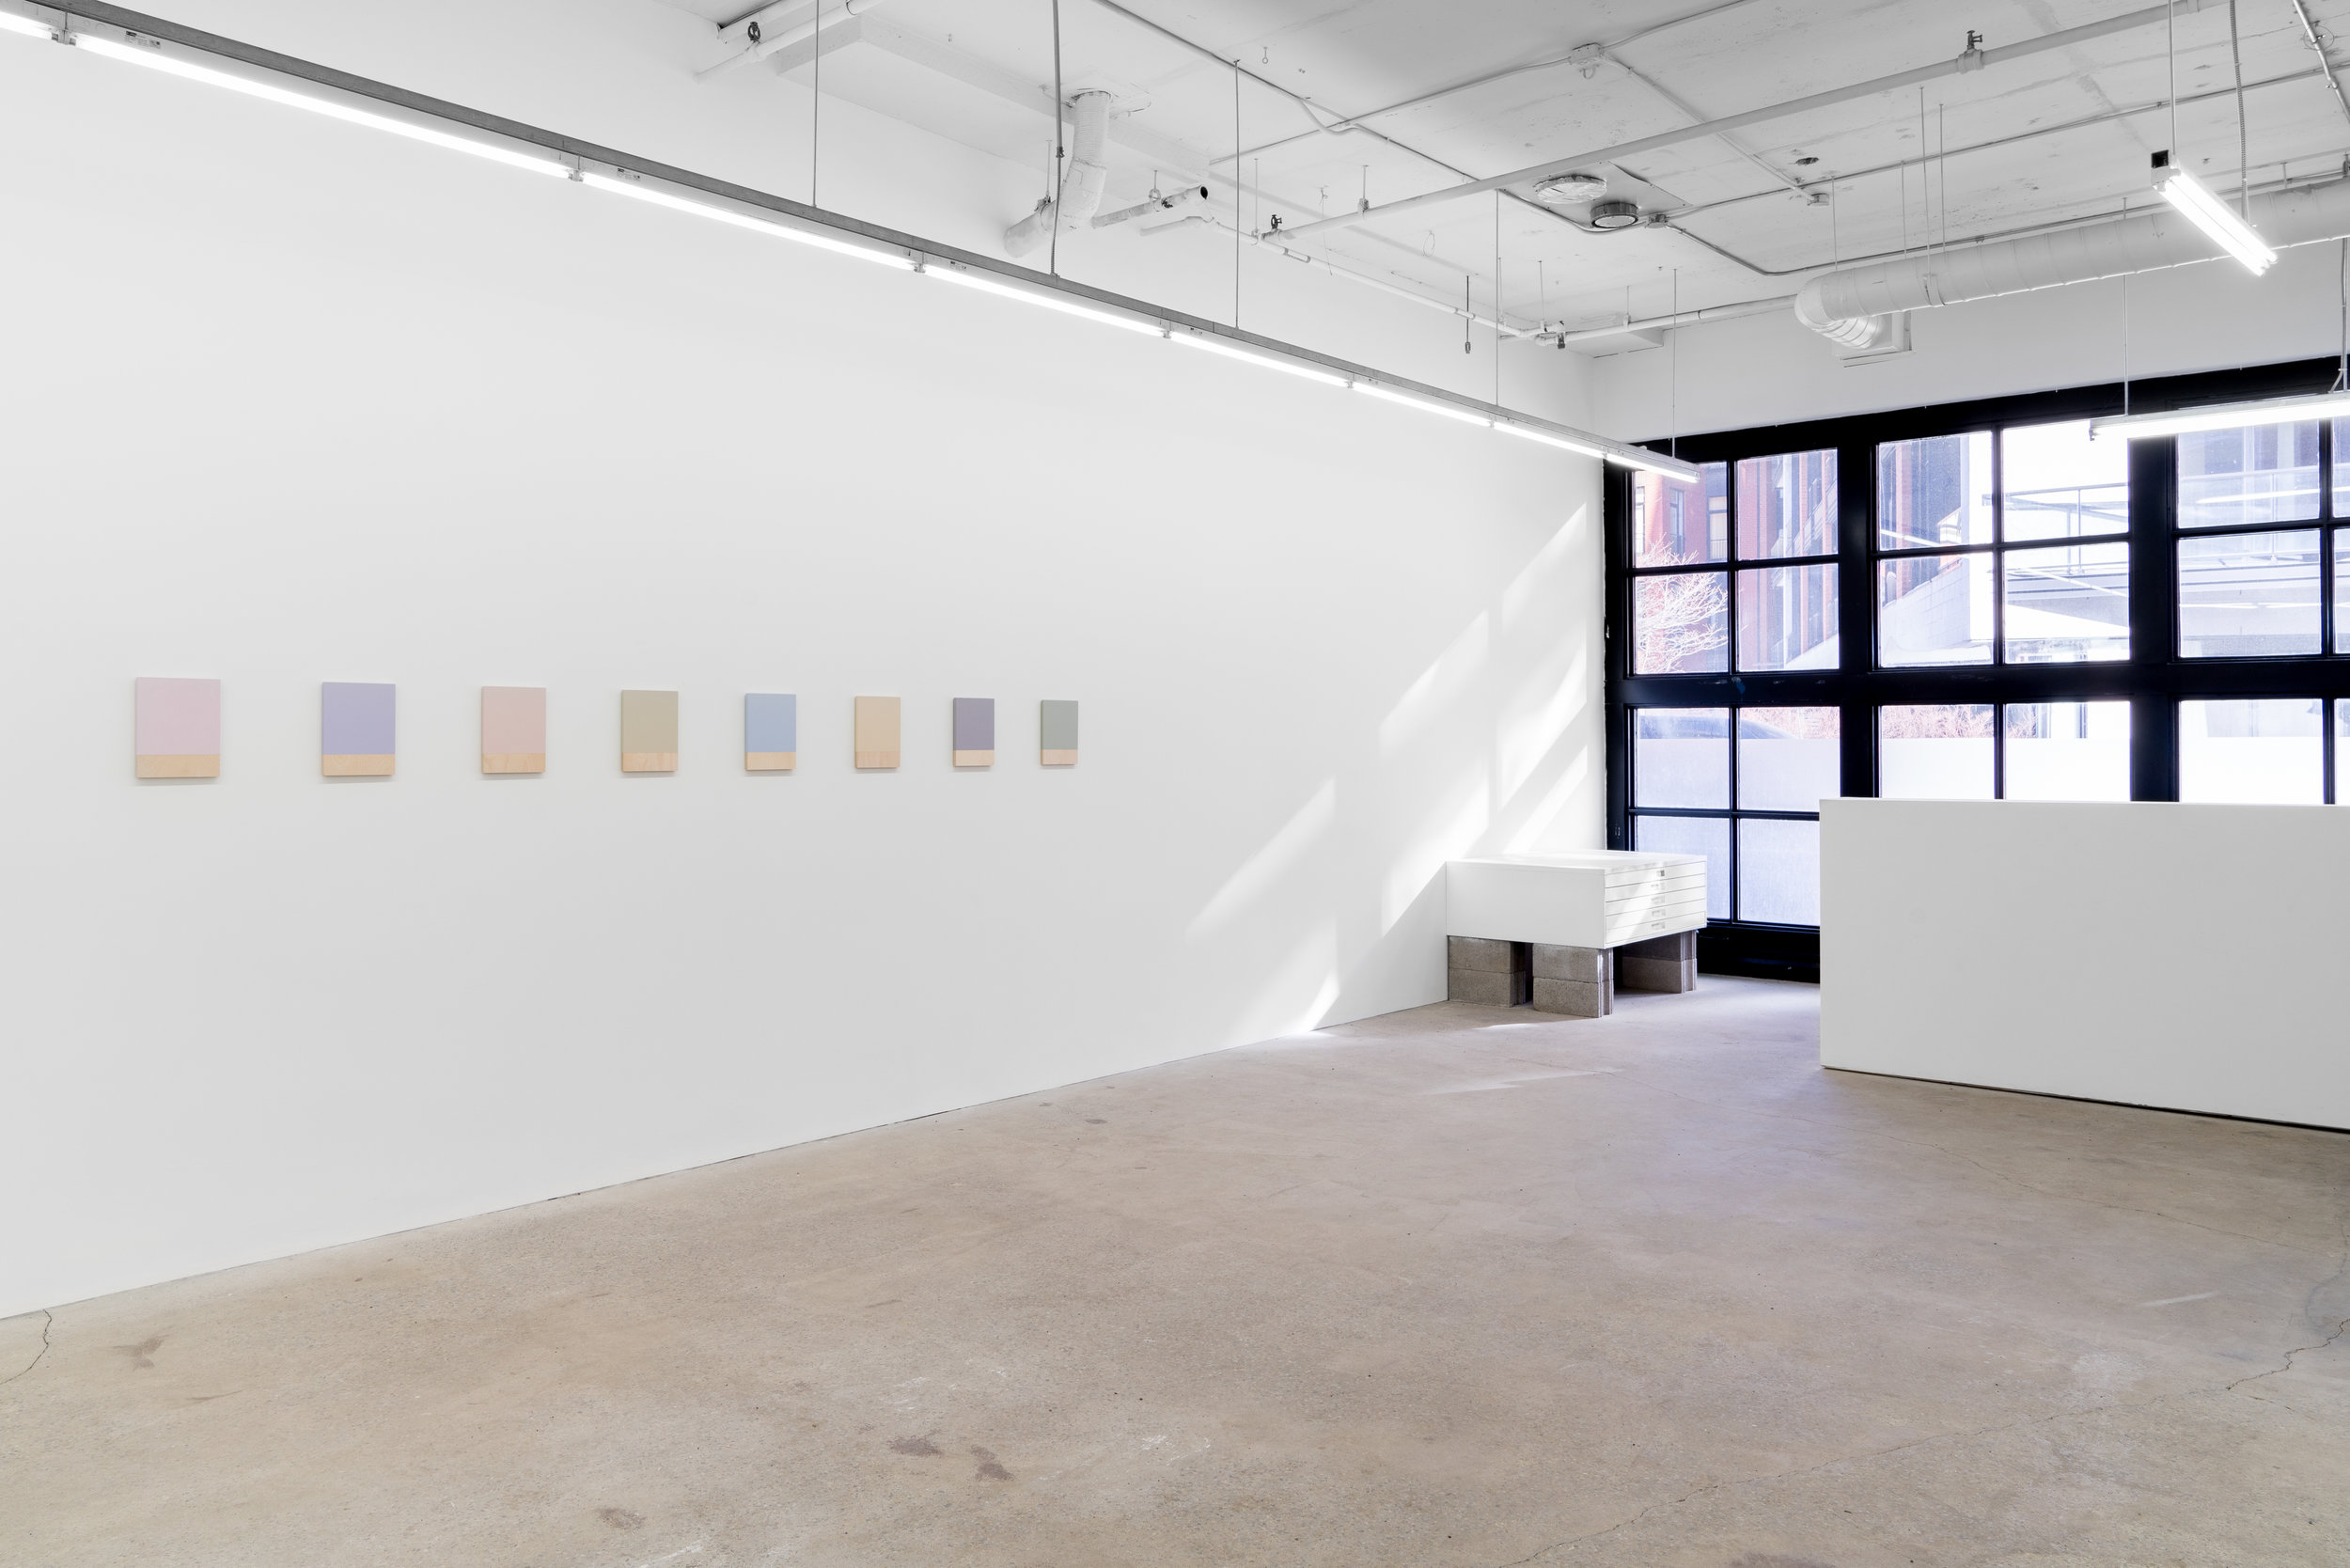 GalerieNicolasRobert (19 of 21).jpg